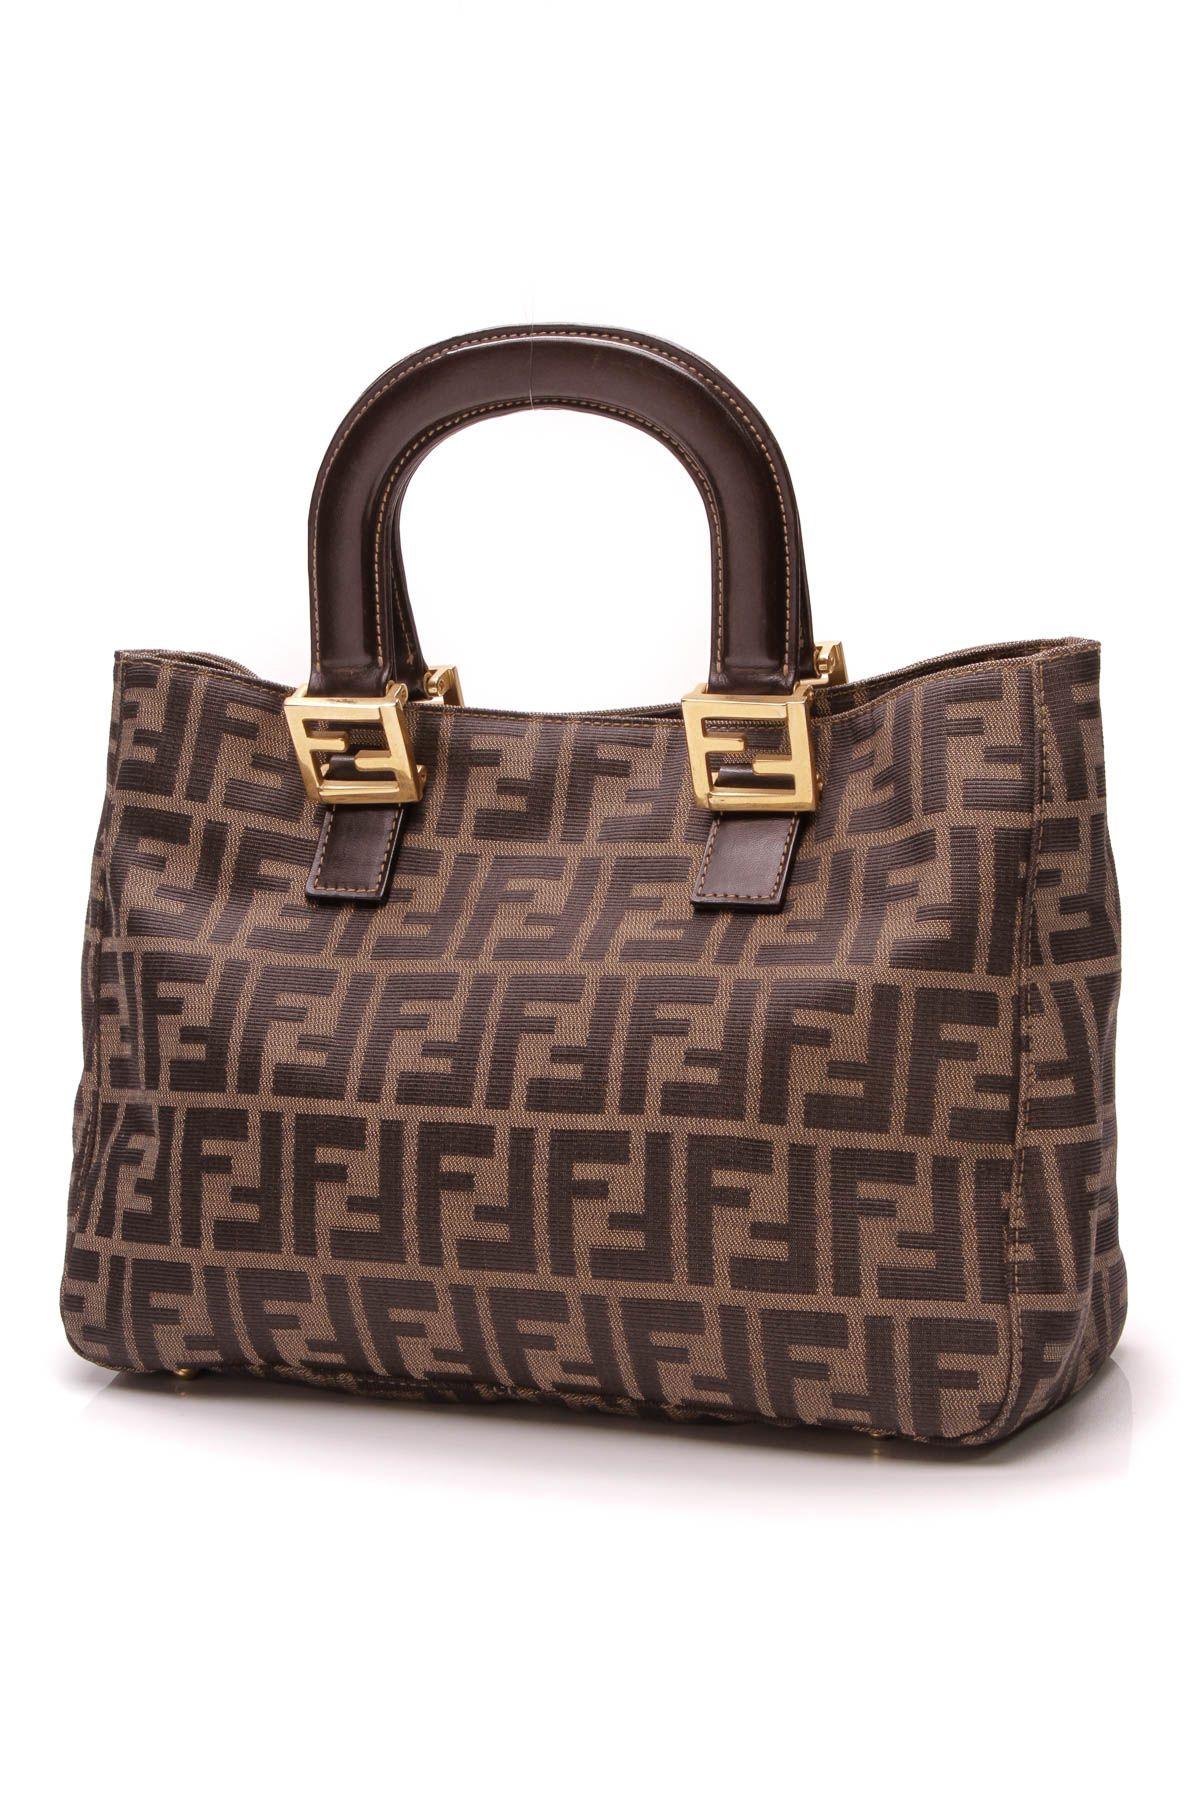 a9349b7a83cc8 Fendi Zucca Vintage Tote Bag - Brown